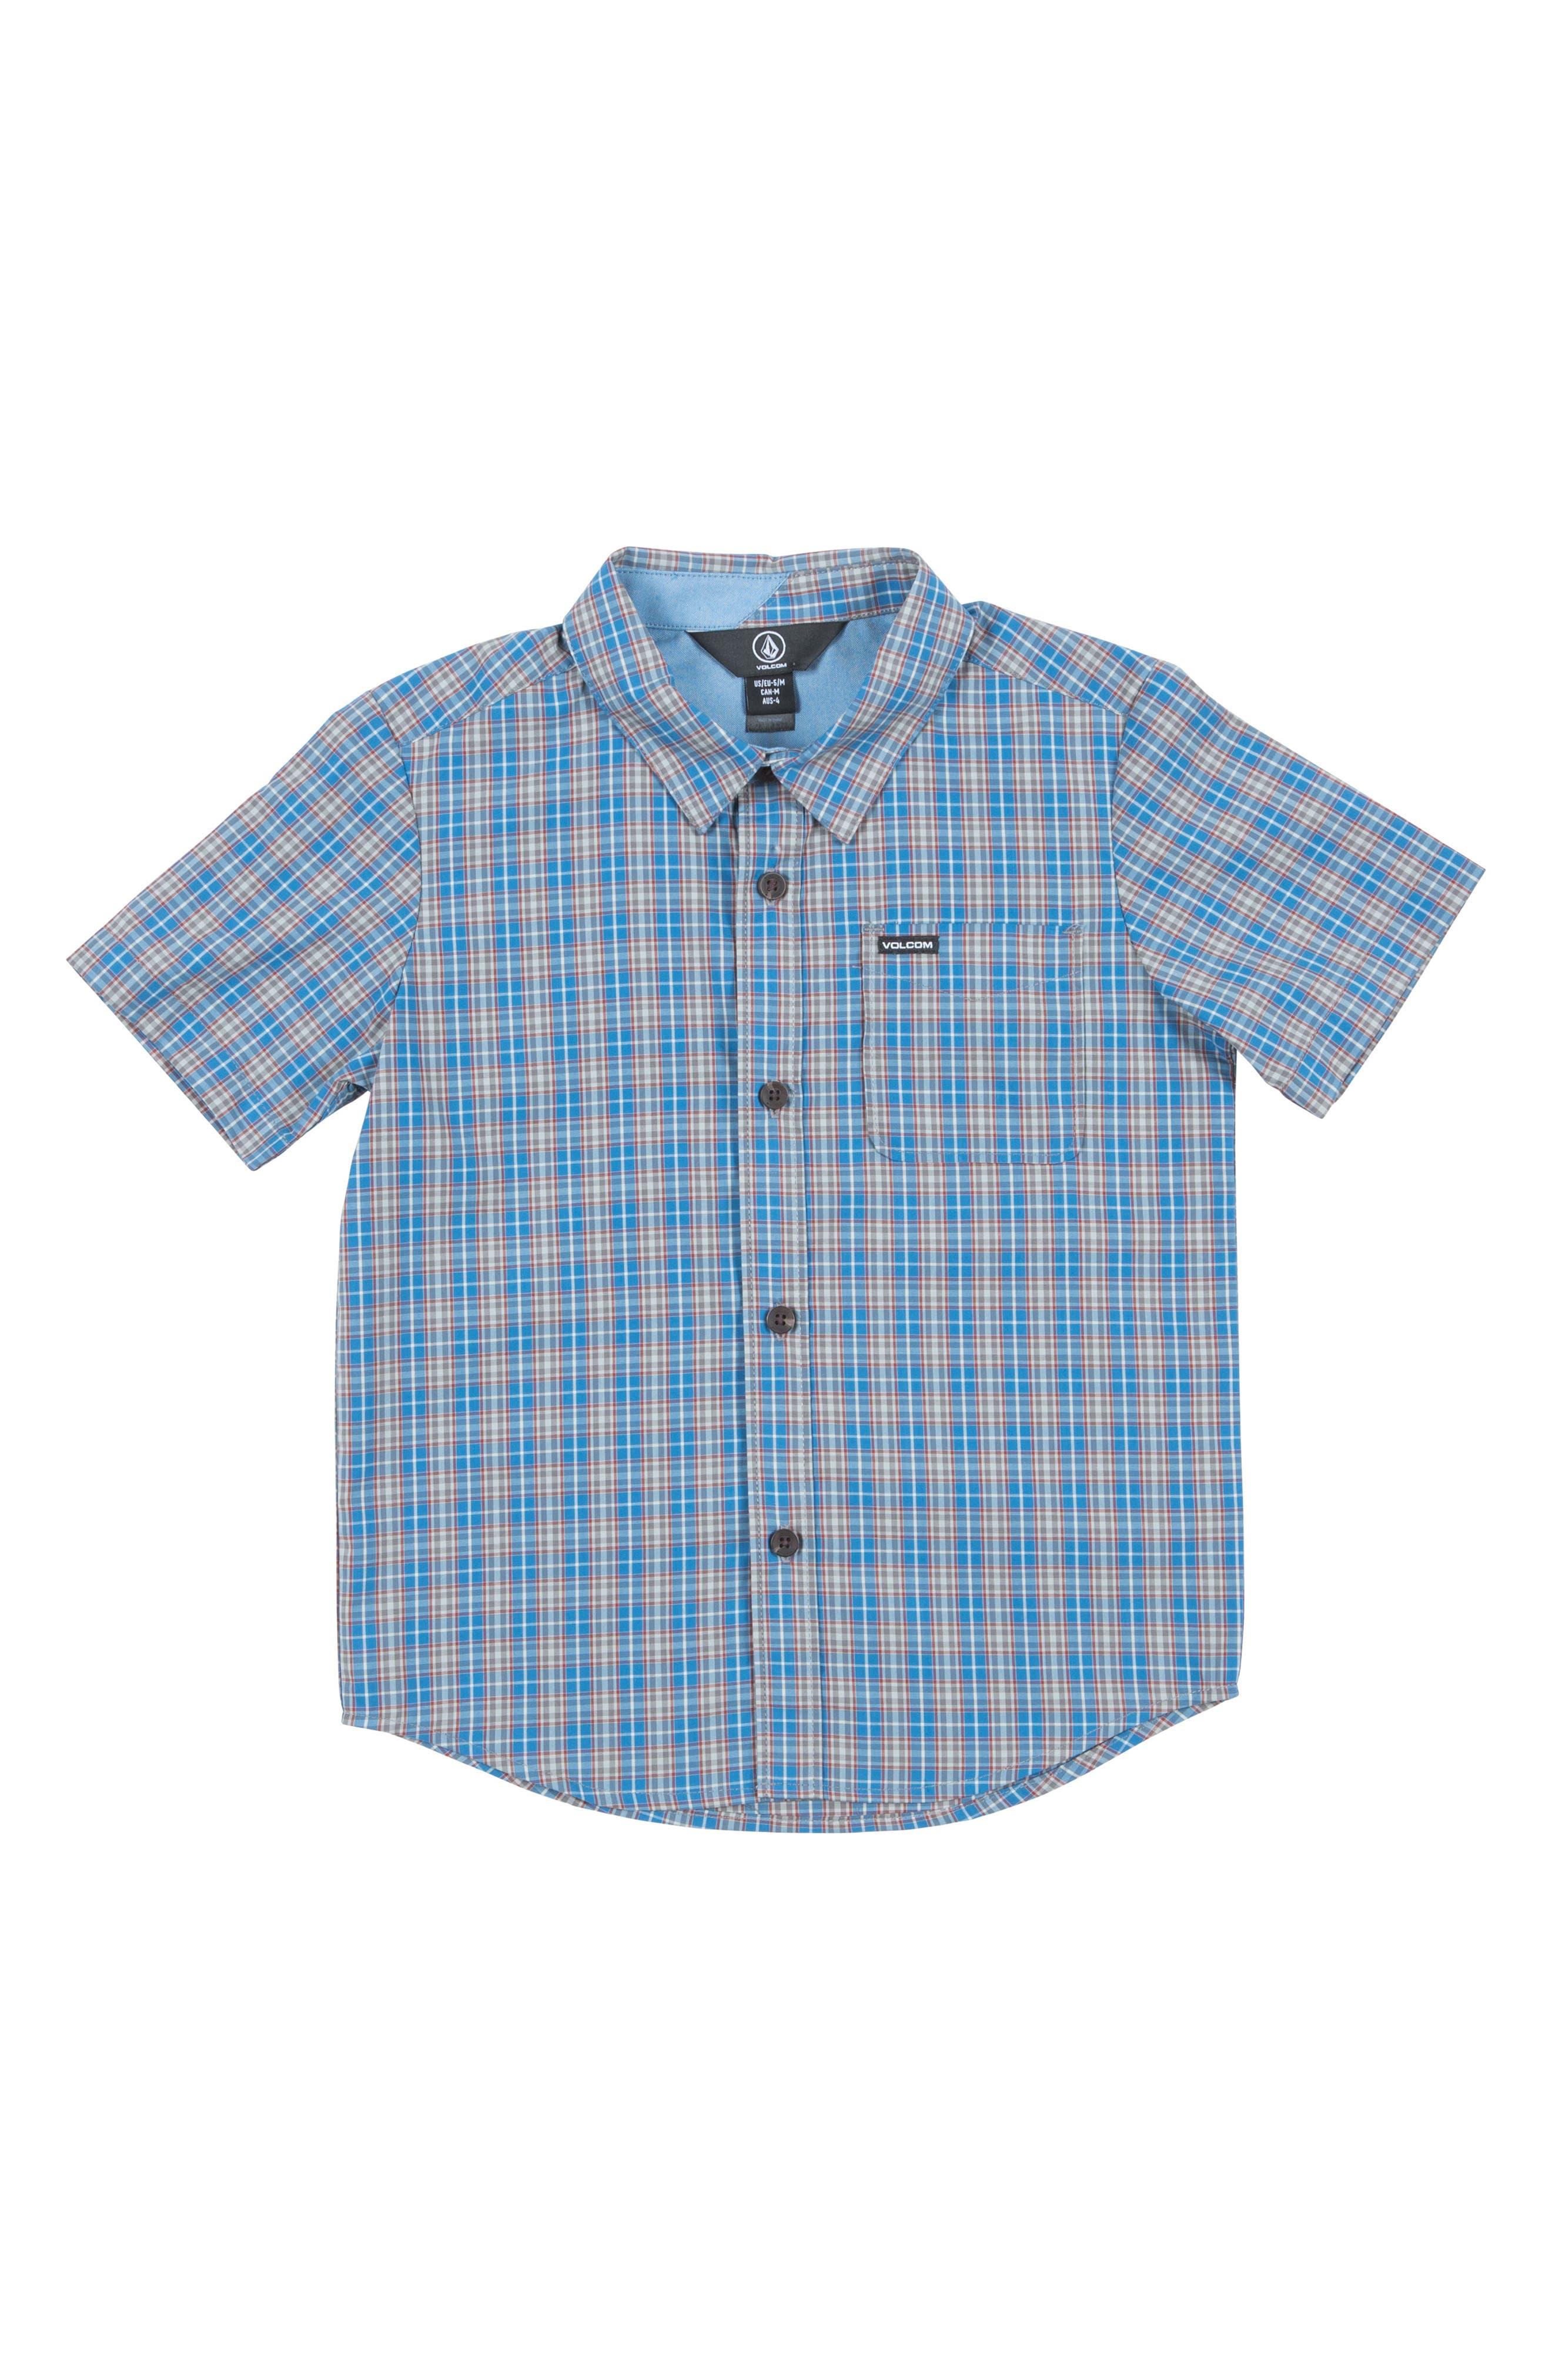 VOLCOM Harper Plaid Woven Shirt